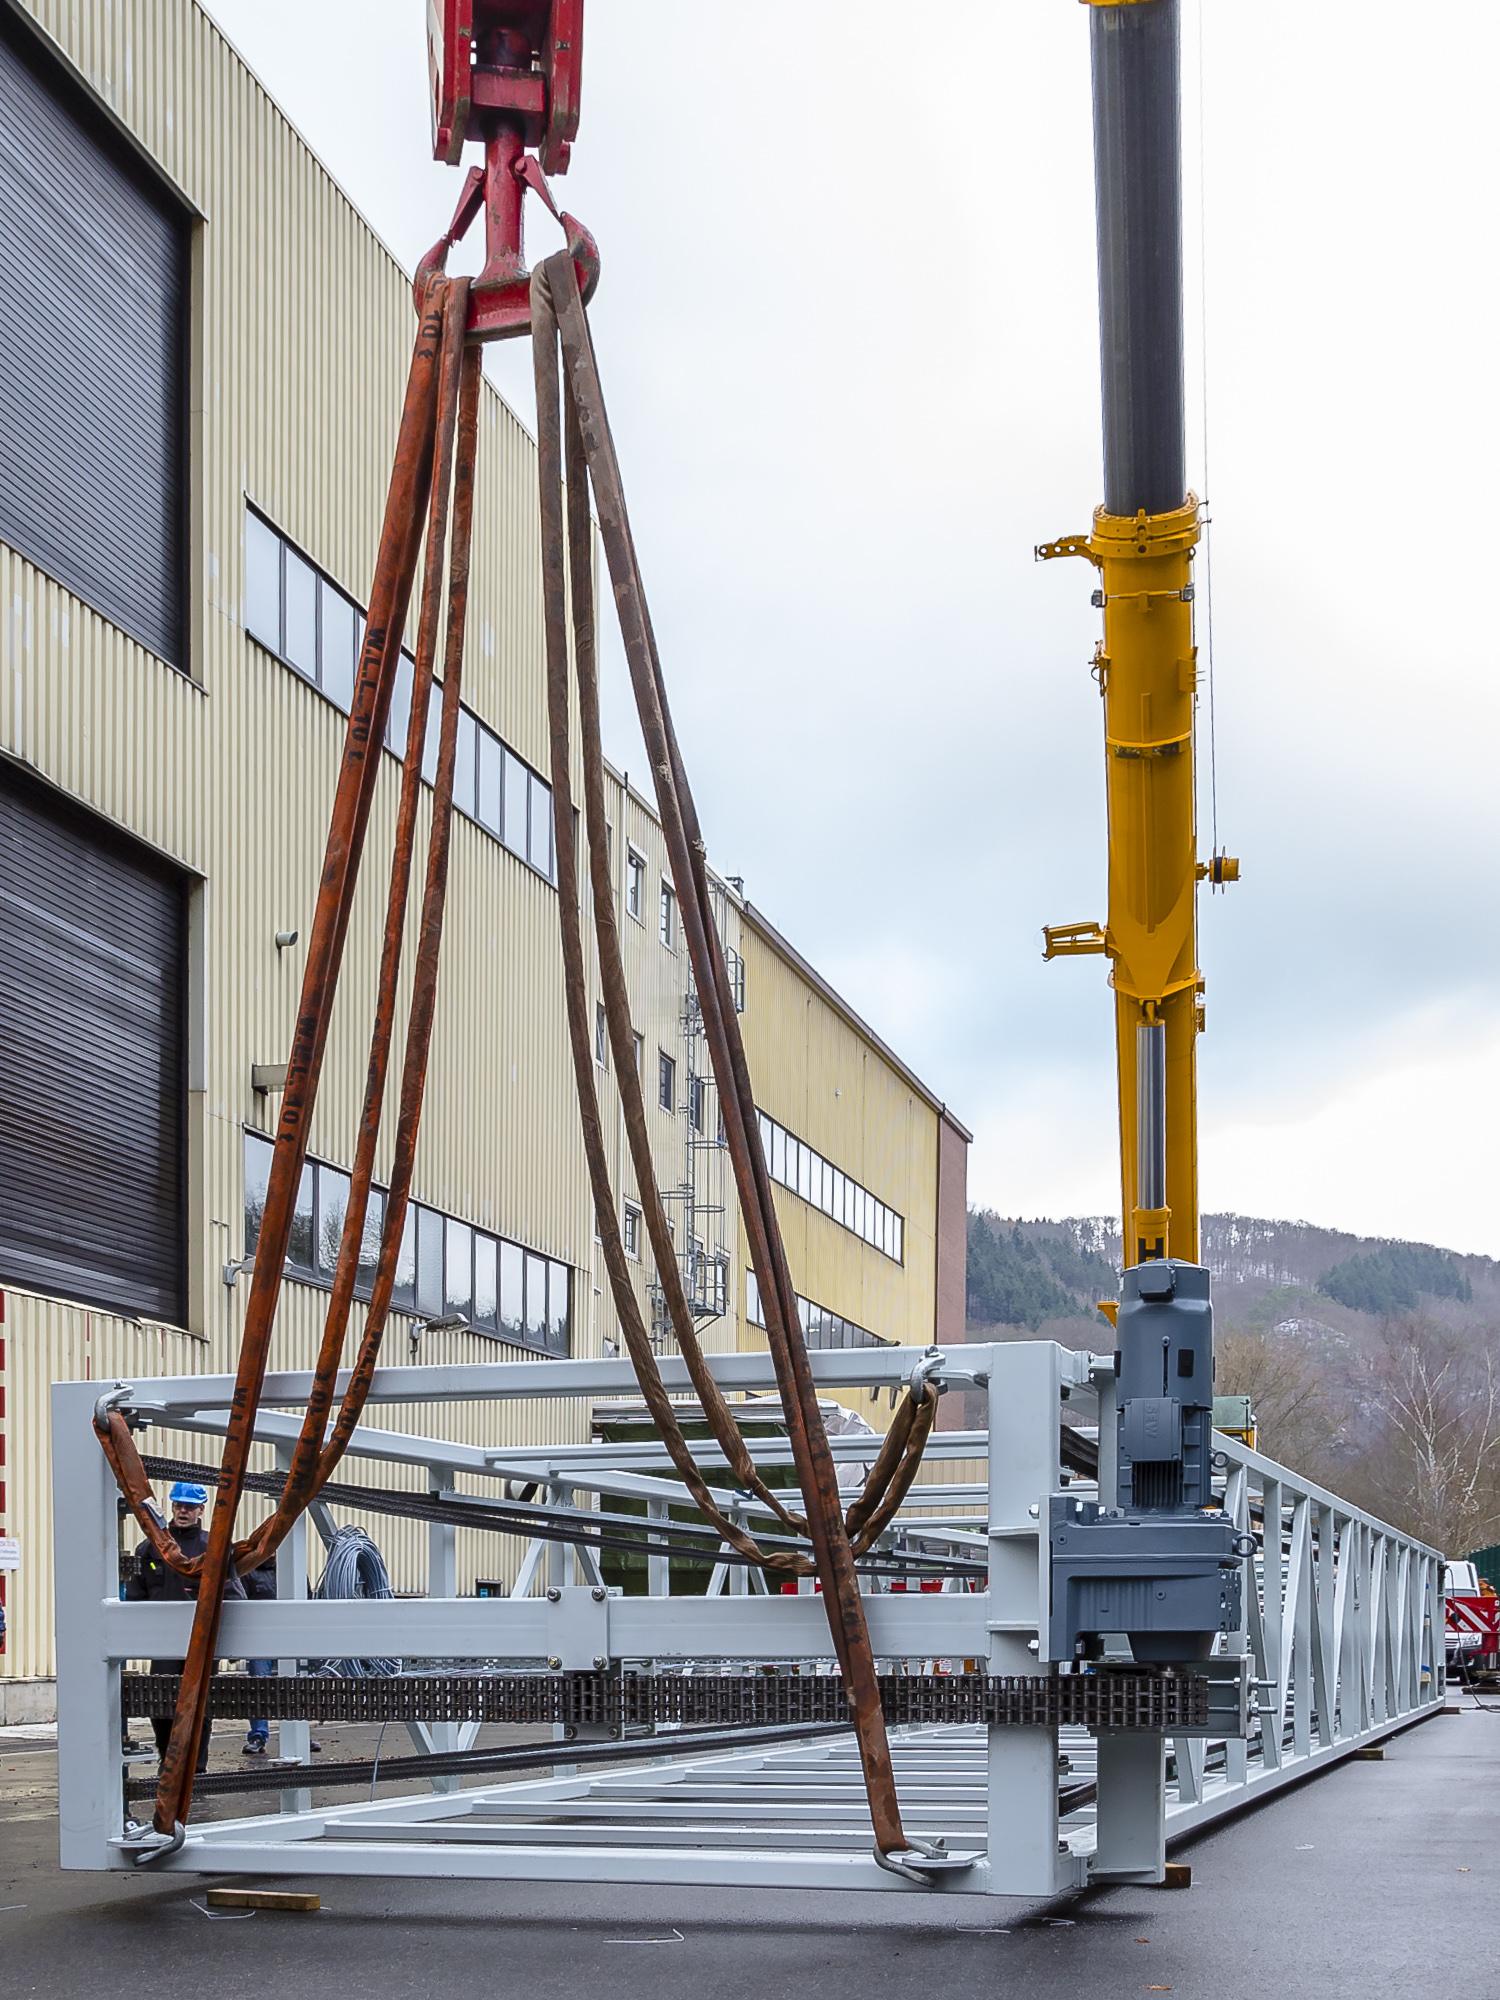 180328-Clariant-23m-Vertikalfoerderer--Verfahrwagen-Fahrstuhlschacht-14.jpg